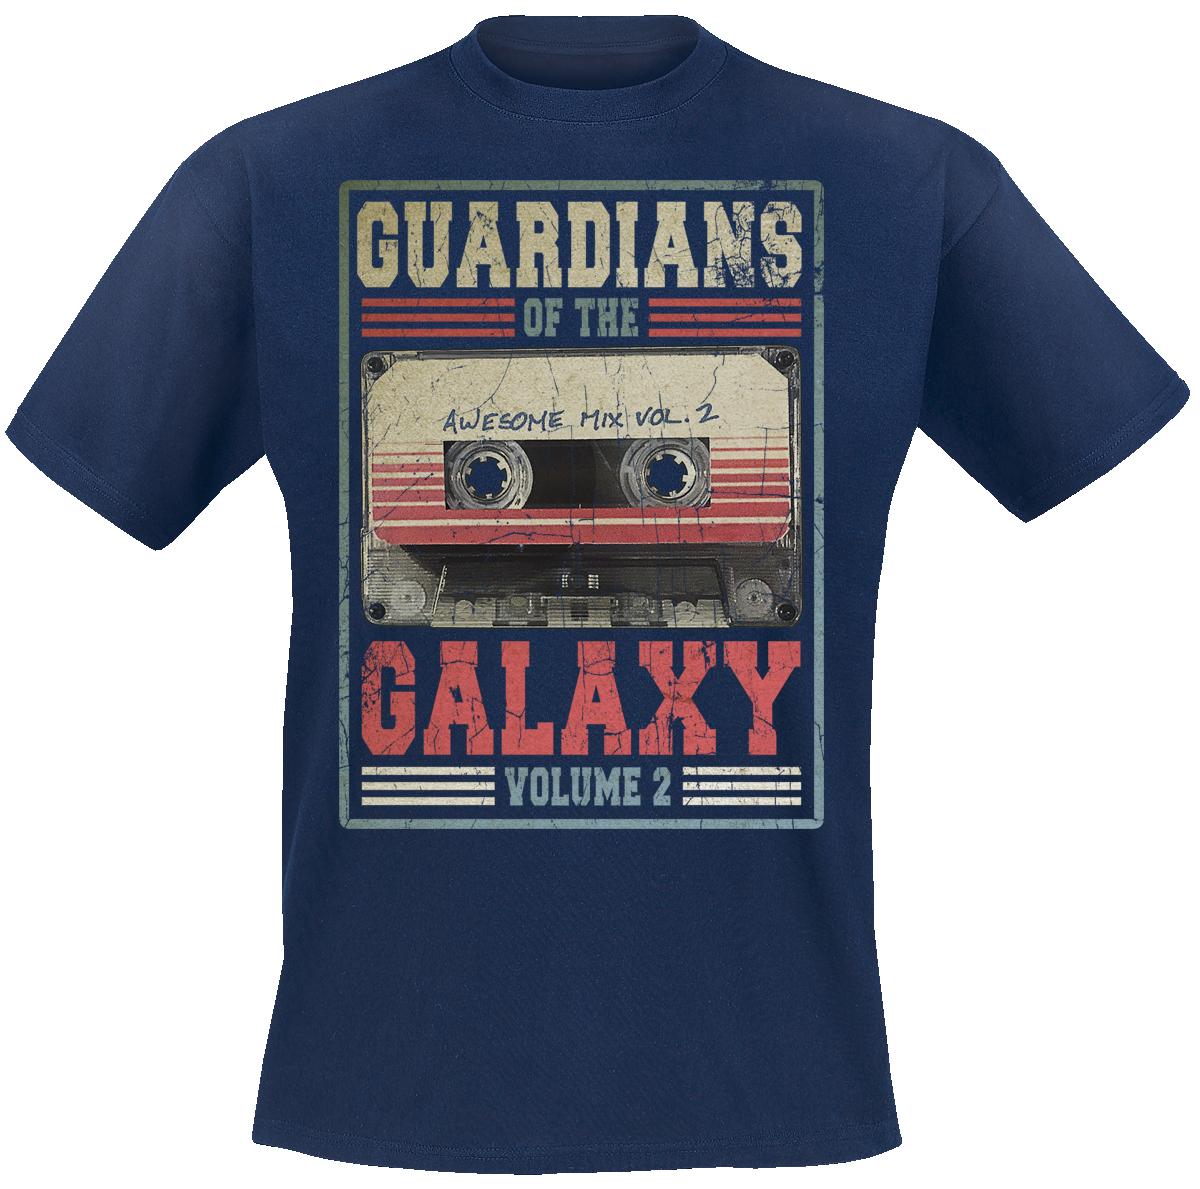 Guardians Of The Galaxy - 2 - Mixtape Vol. 2 - T-Shirt - navy image